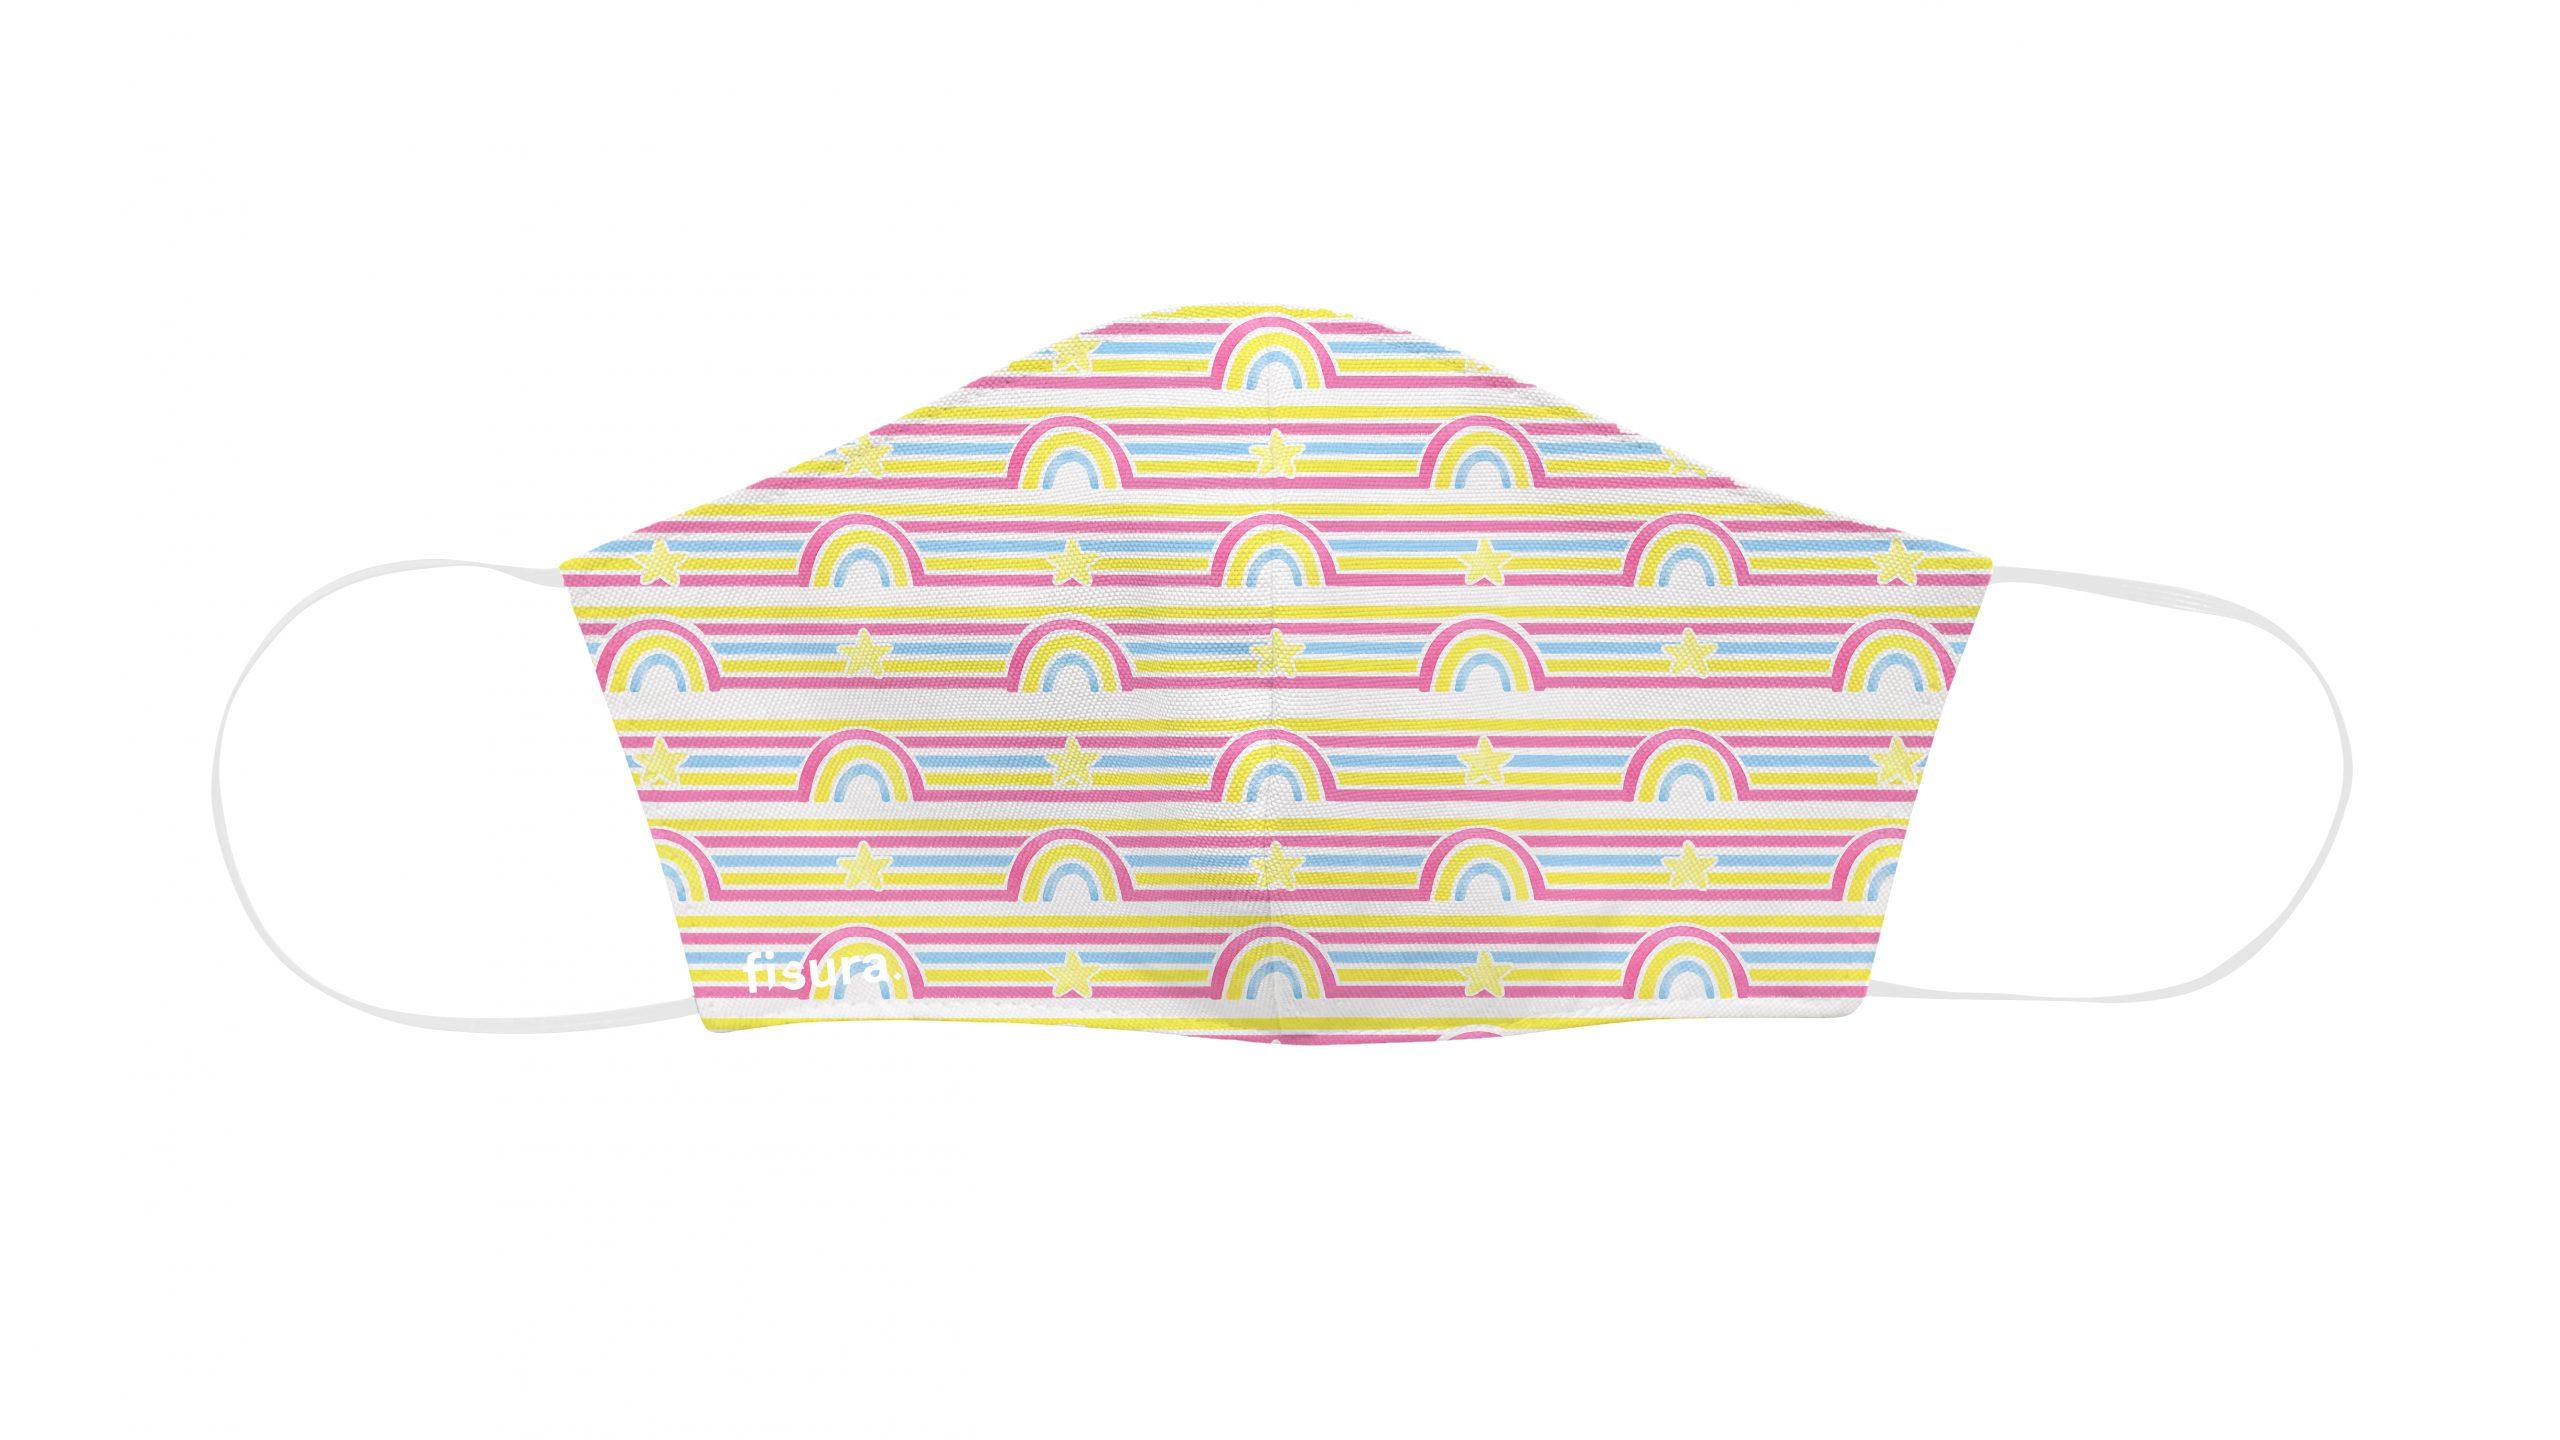 MAscarilla arcoiris